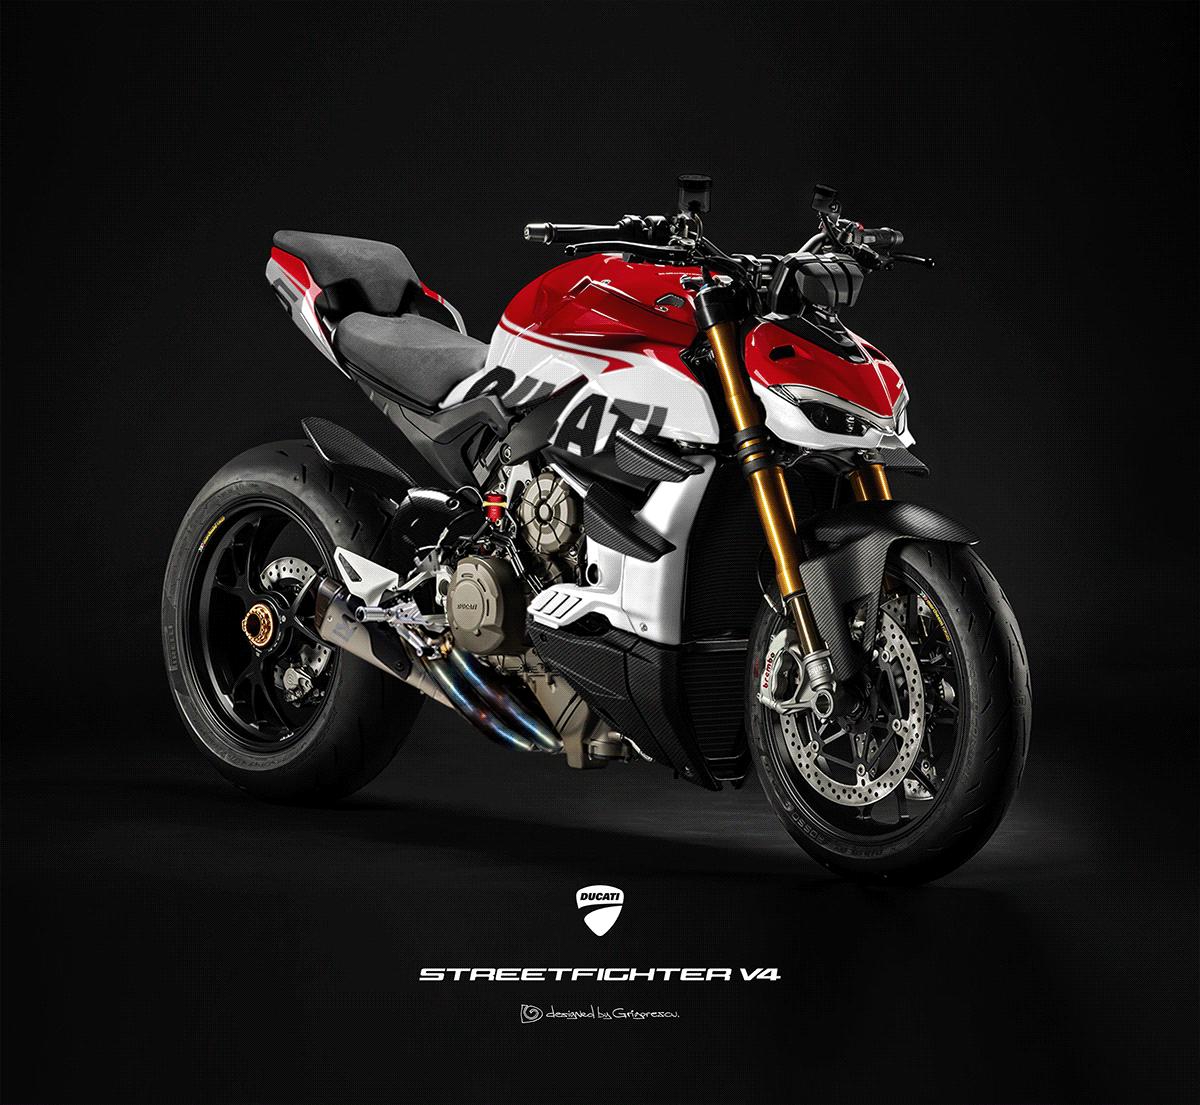 2020 Ducati Streetfighter V4 Design Project On Behance In 2020 Ducati Ducati Motorbike Super Bikes